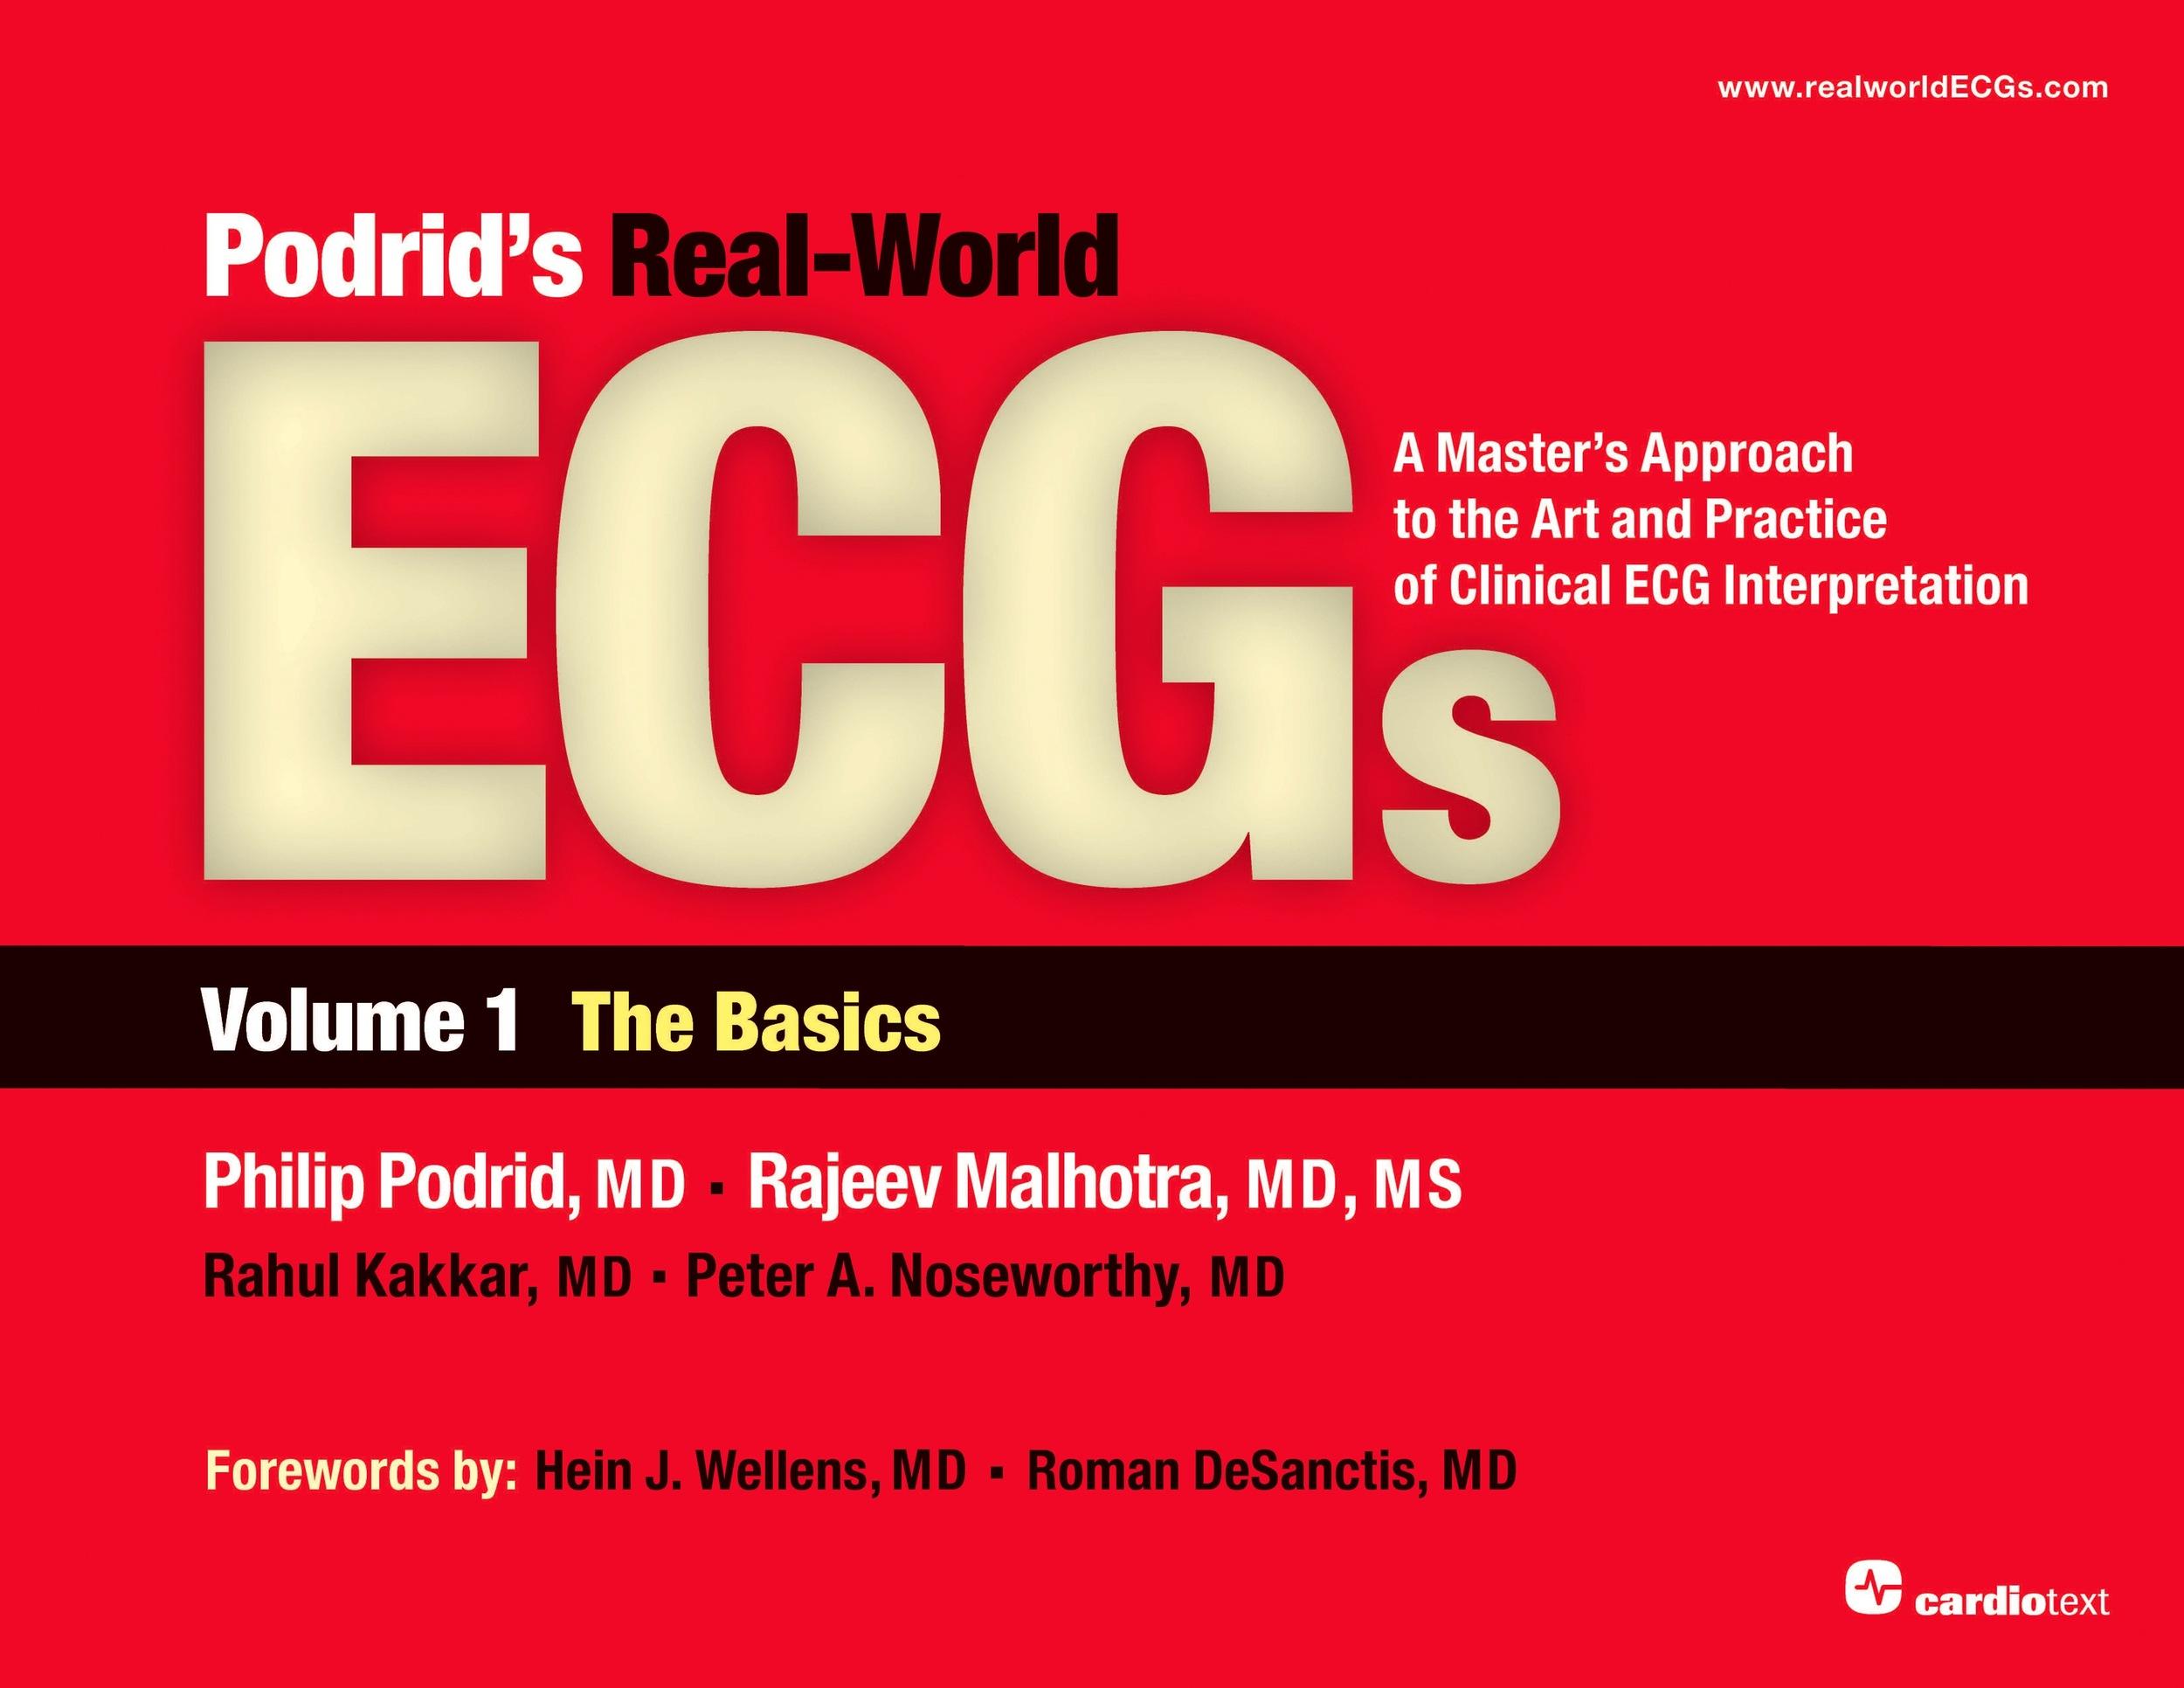 Podrid's Real-World ECGs Volume 1